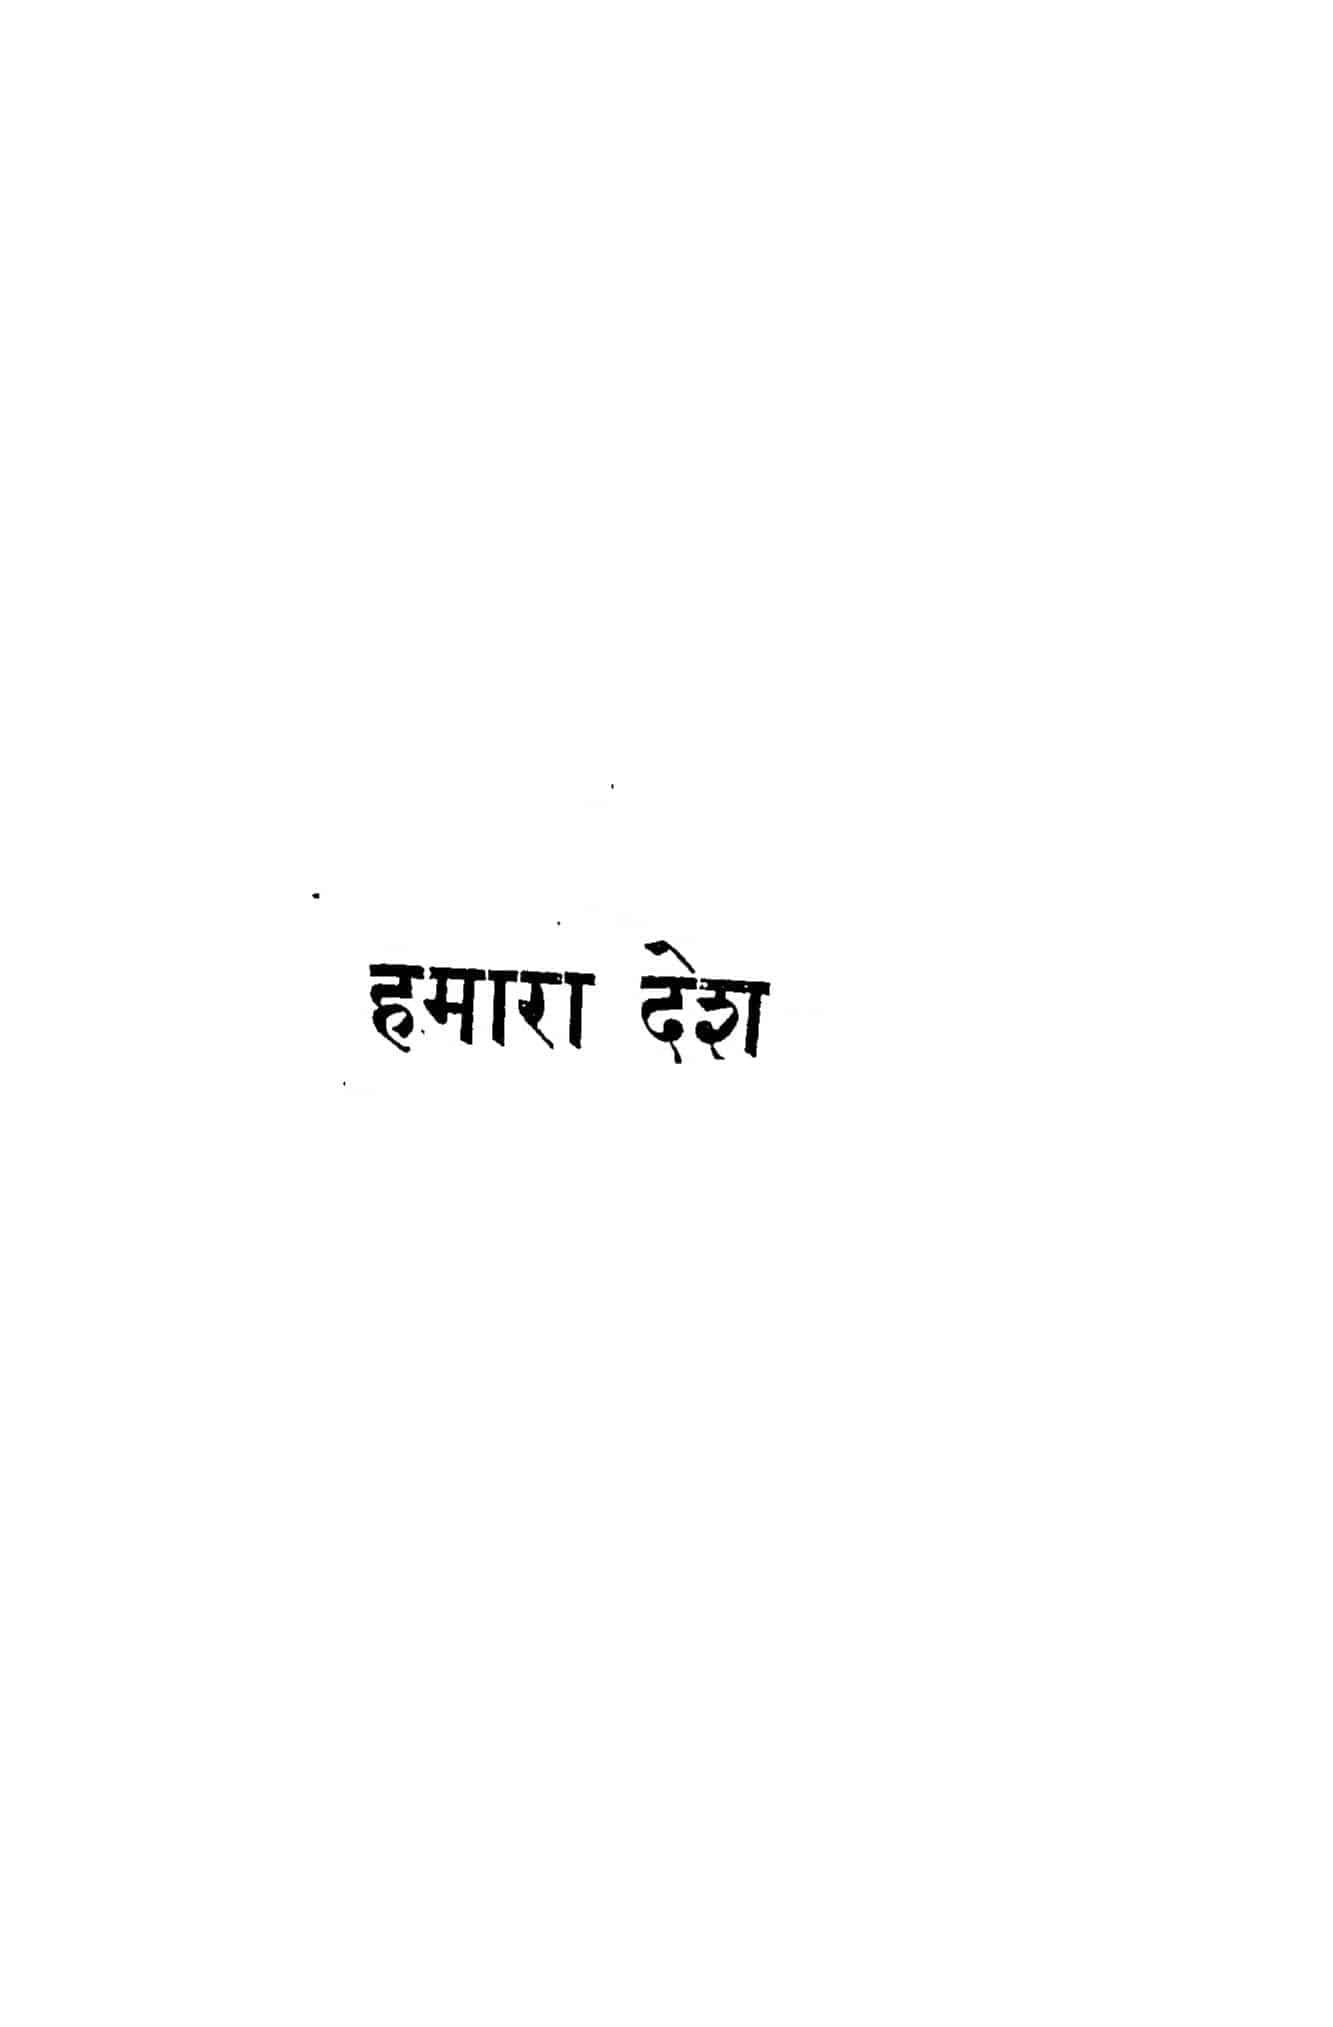 Hamara Desh by अज्ञात - Unknown